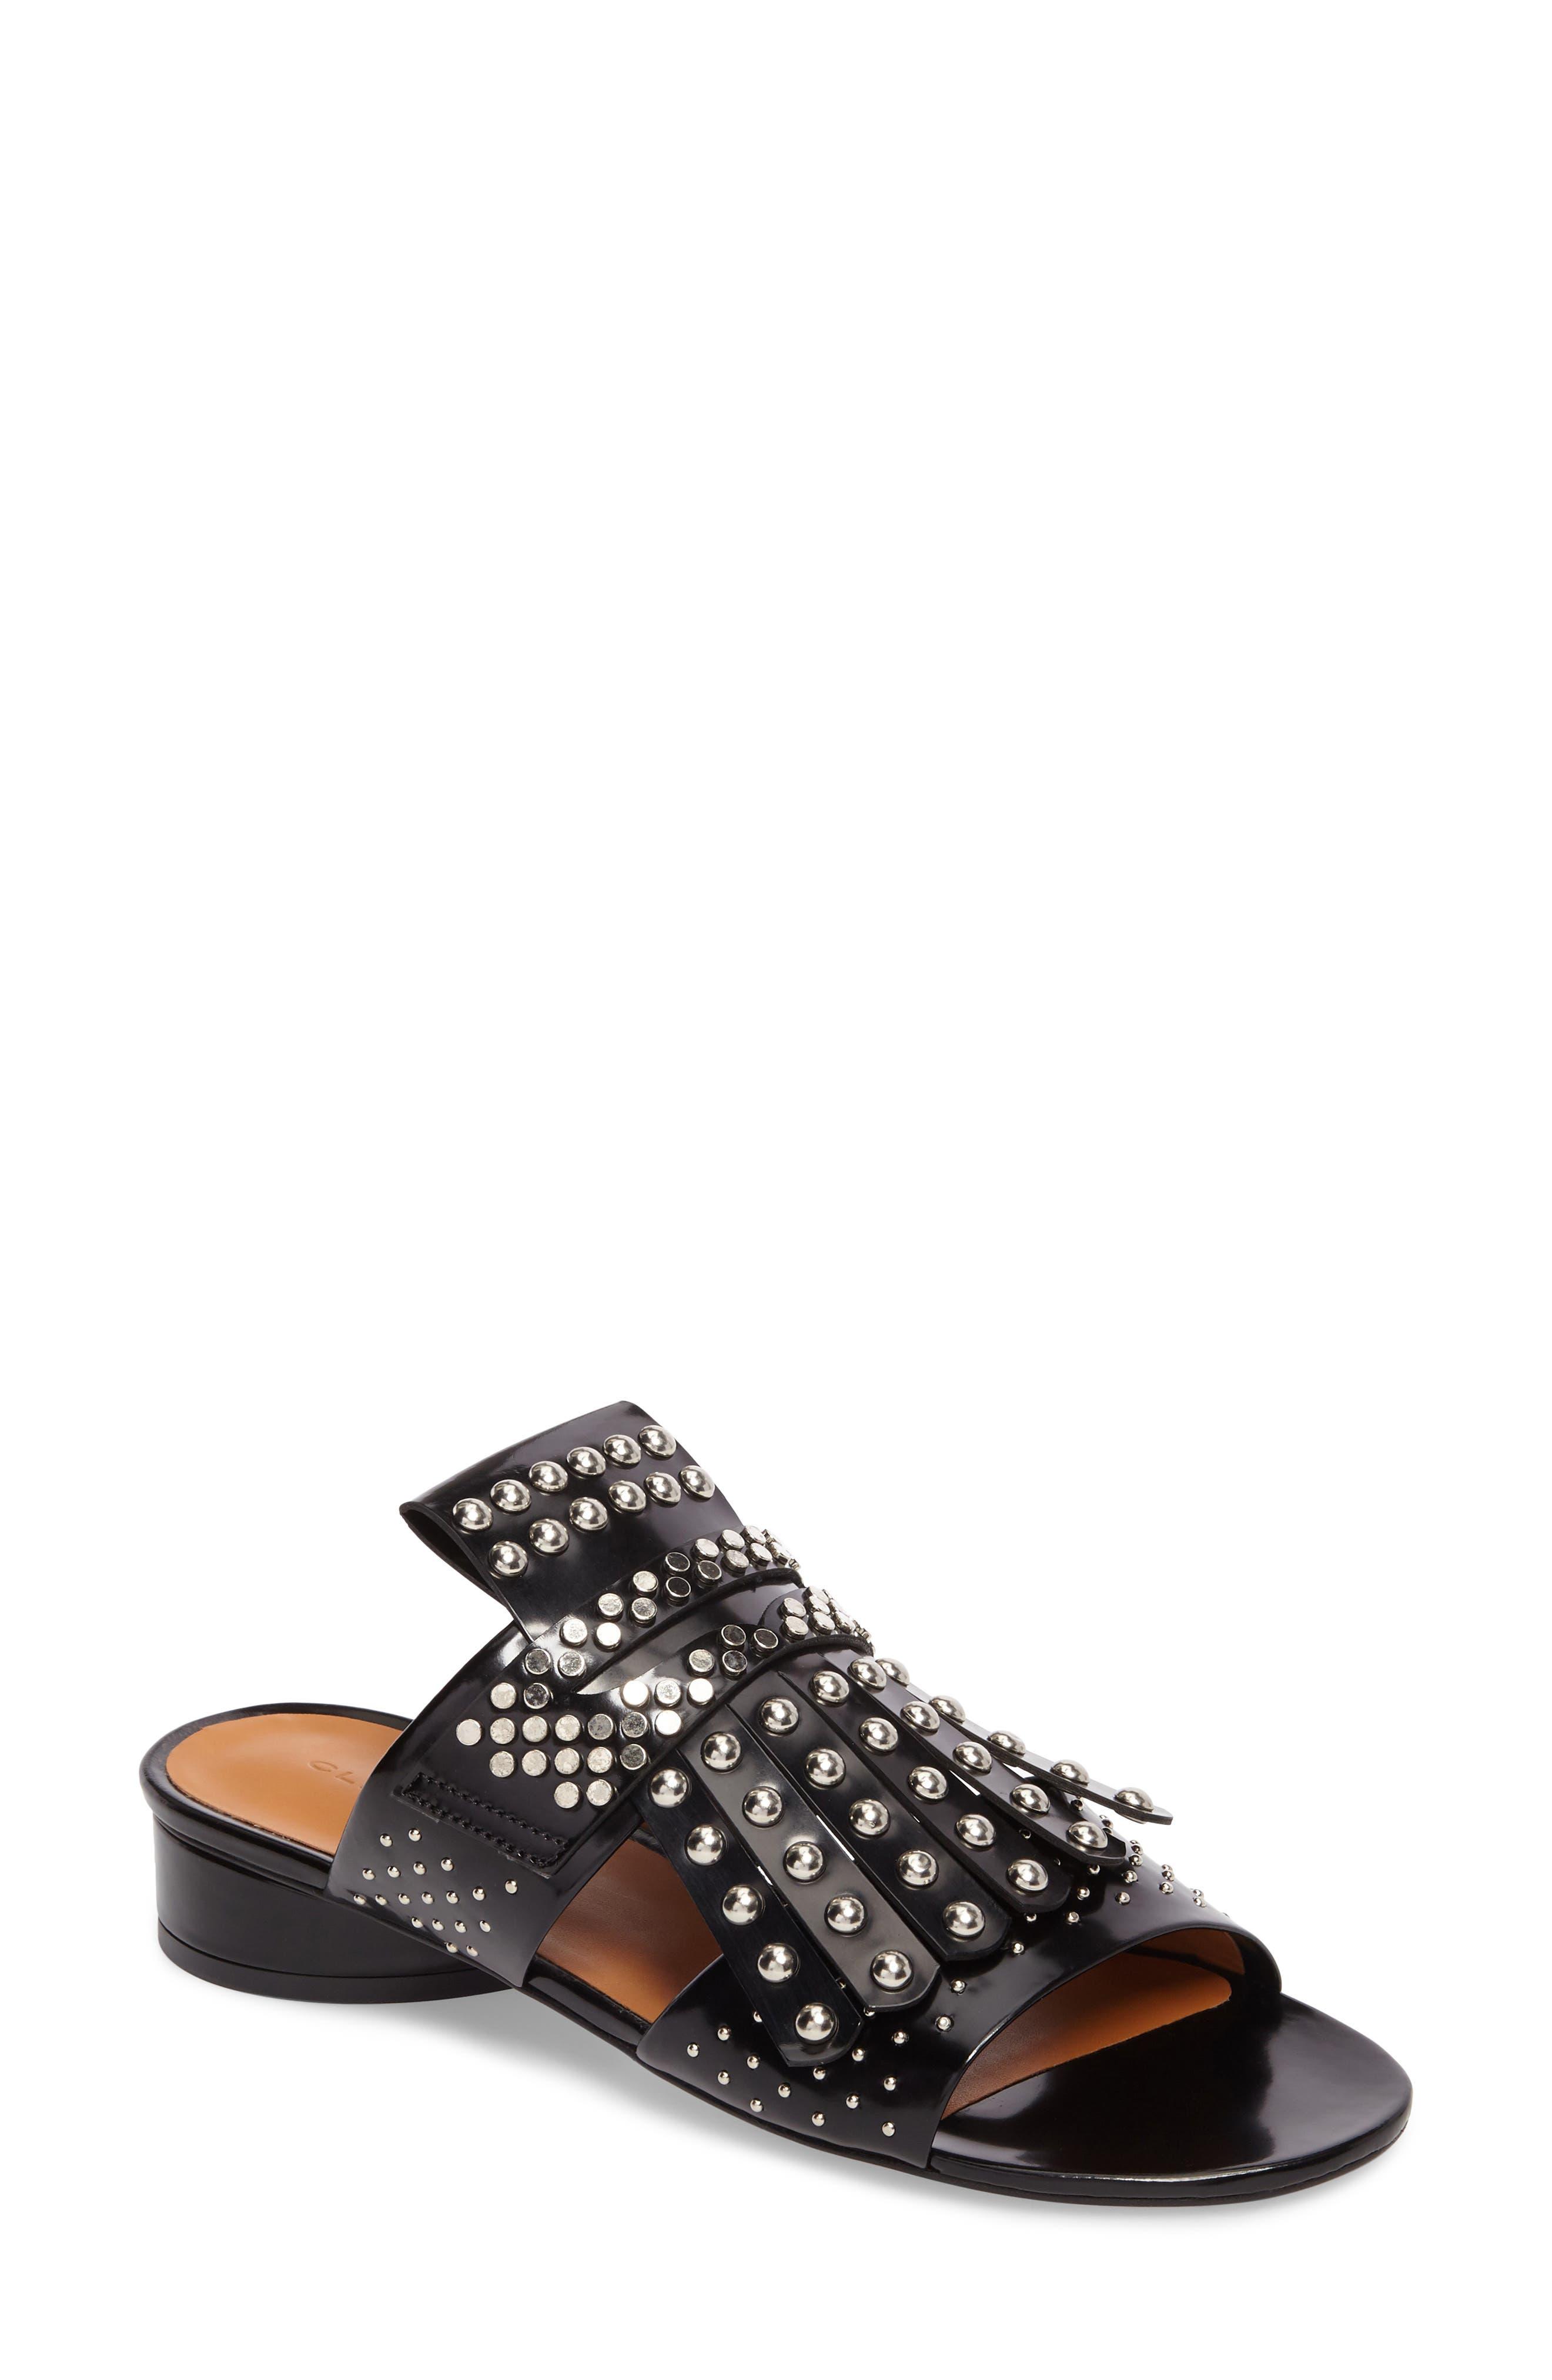 Alternate Image 1 Selected - Robert Clergerie Figlouc Studded Sandal (Women)